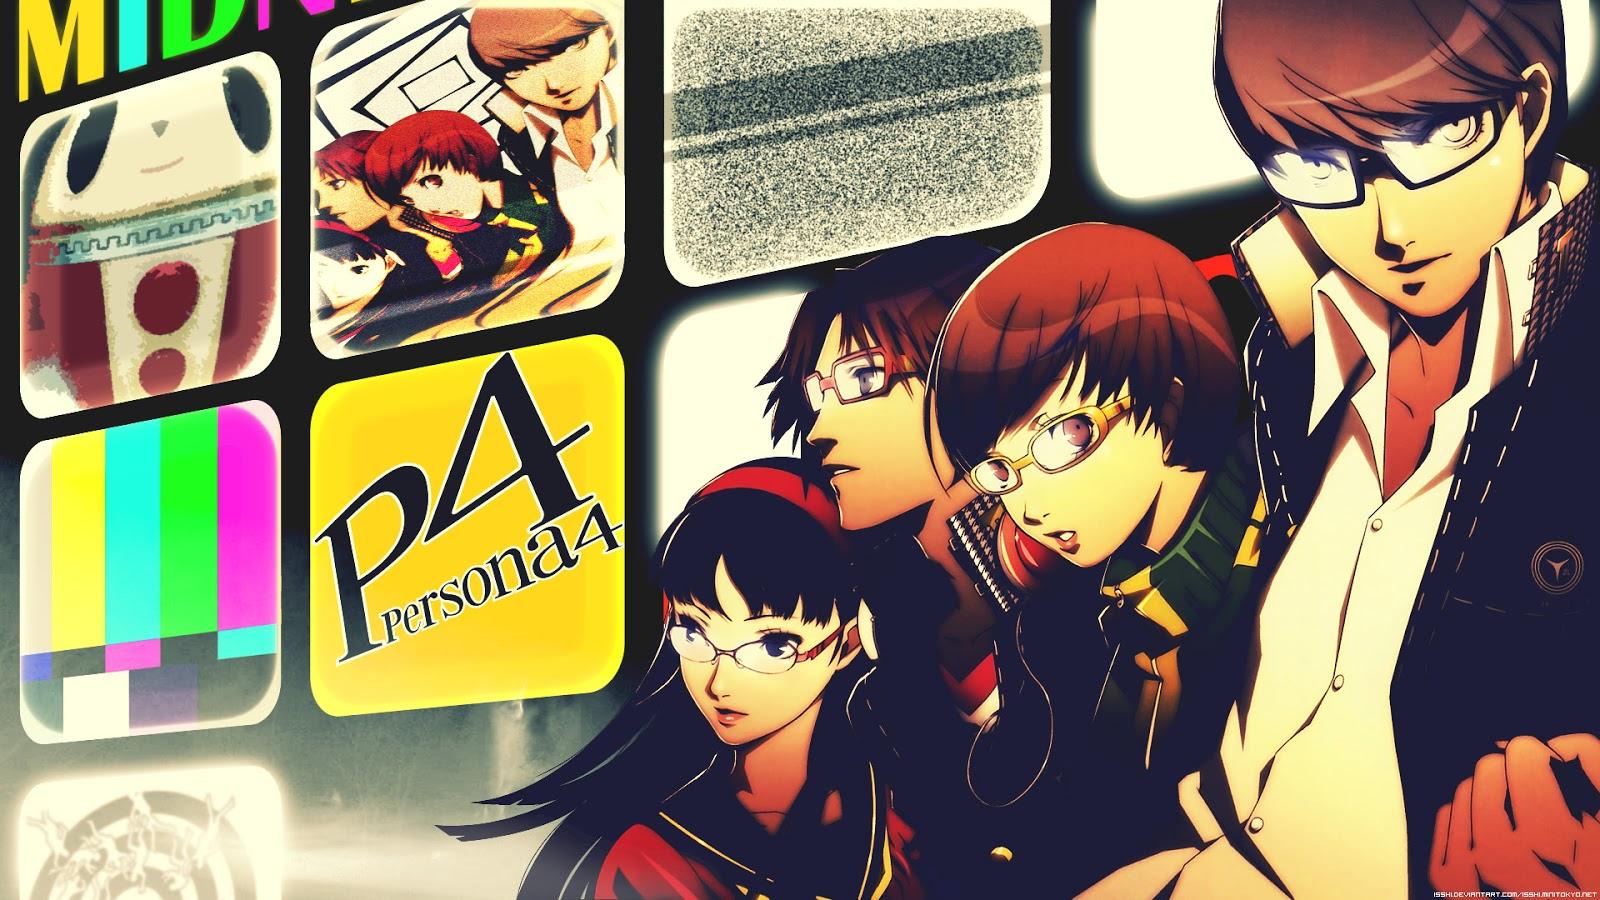 Free download Chie Satonaka P4 Persona 4 Anime HD Wallpaper